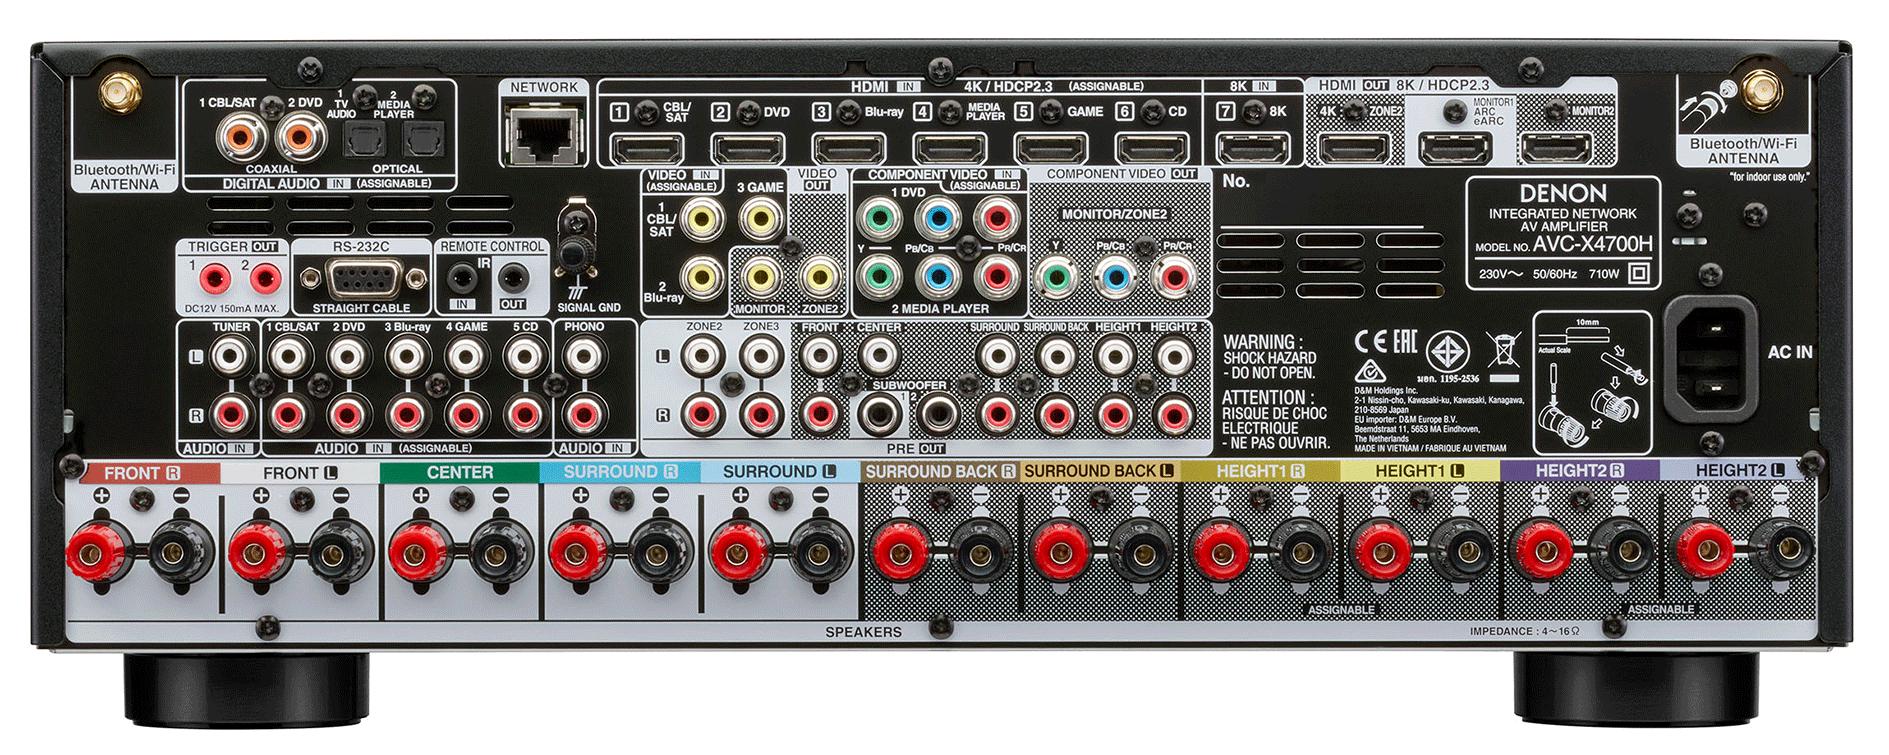 AVC-X4700H Back Testzimmer